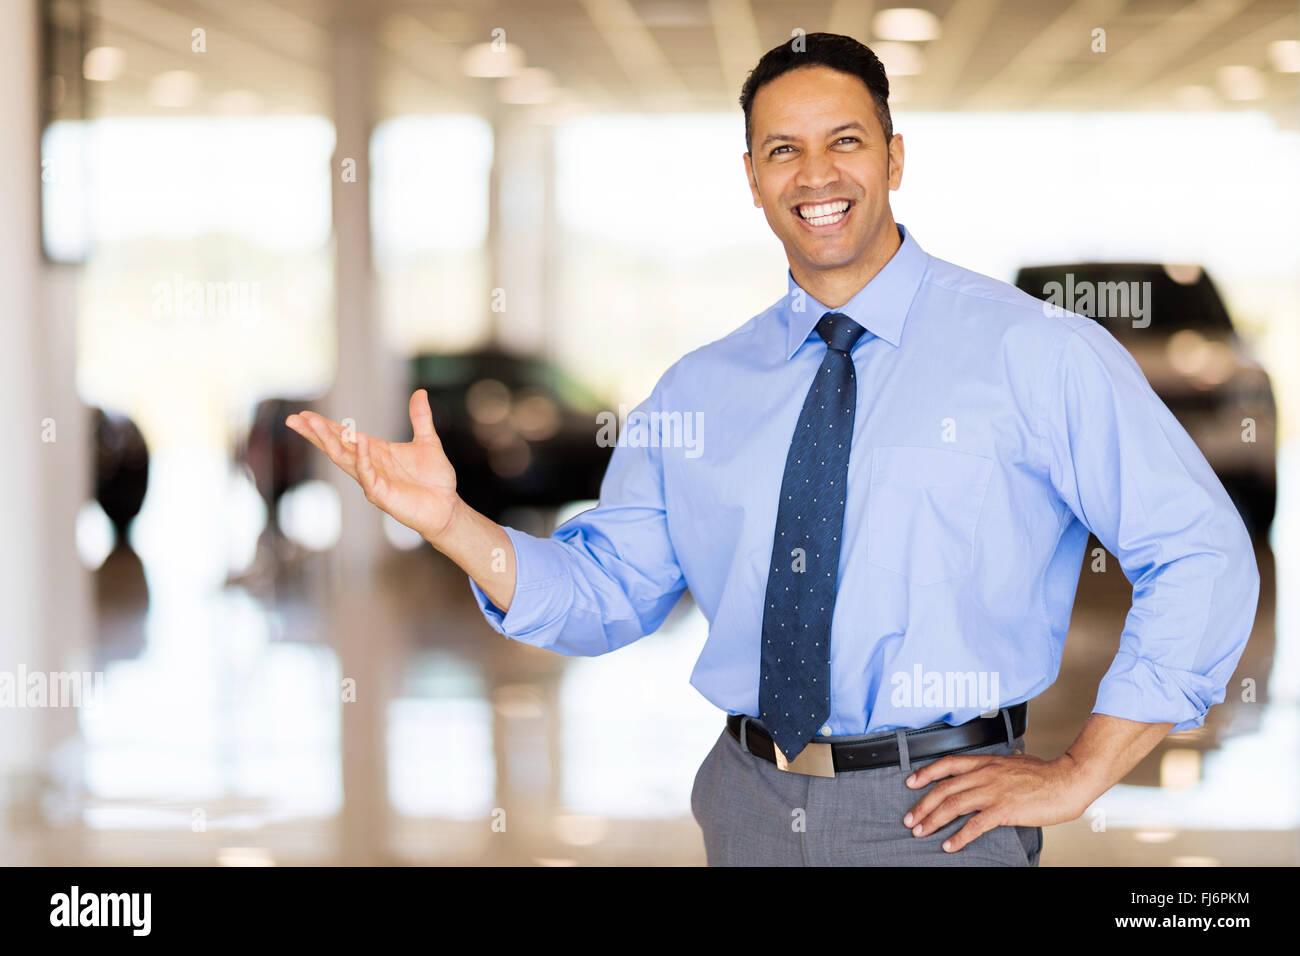 friendly vehicle salesman presenting new cars at showroom - Stock Image